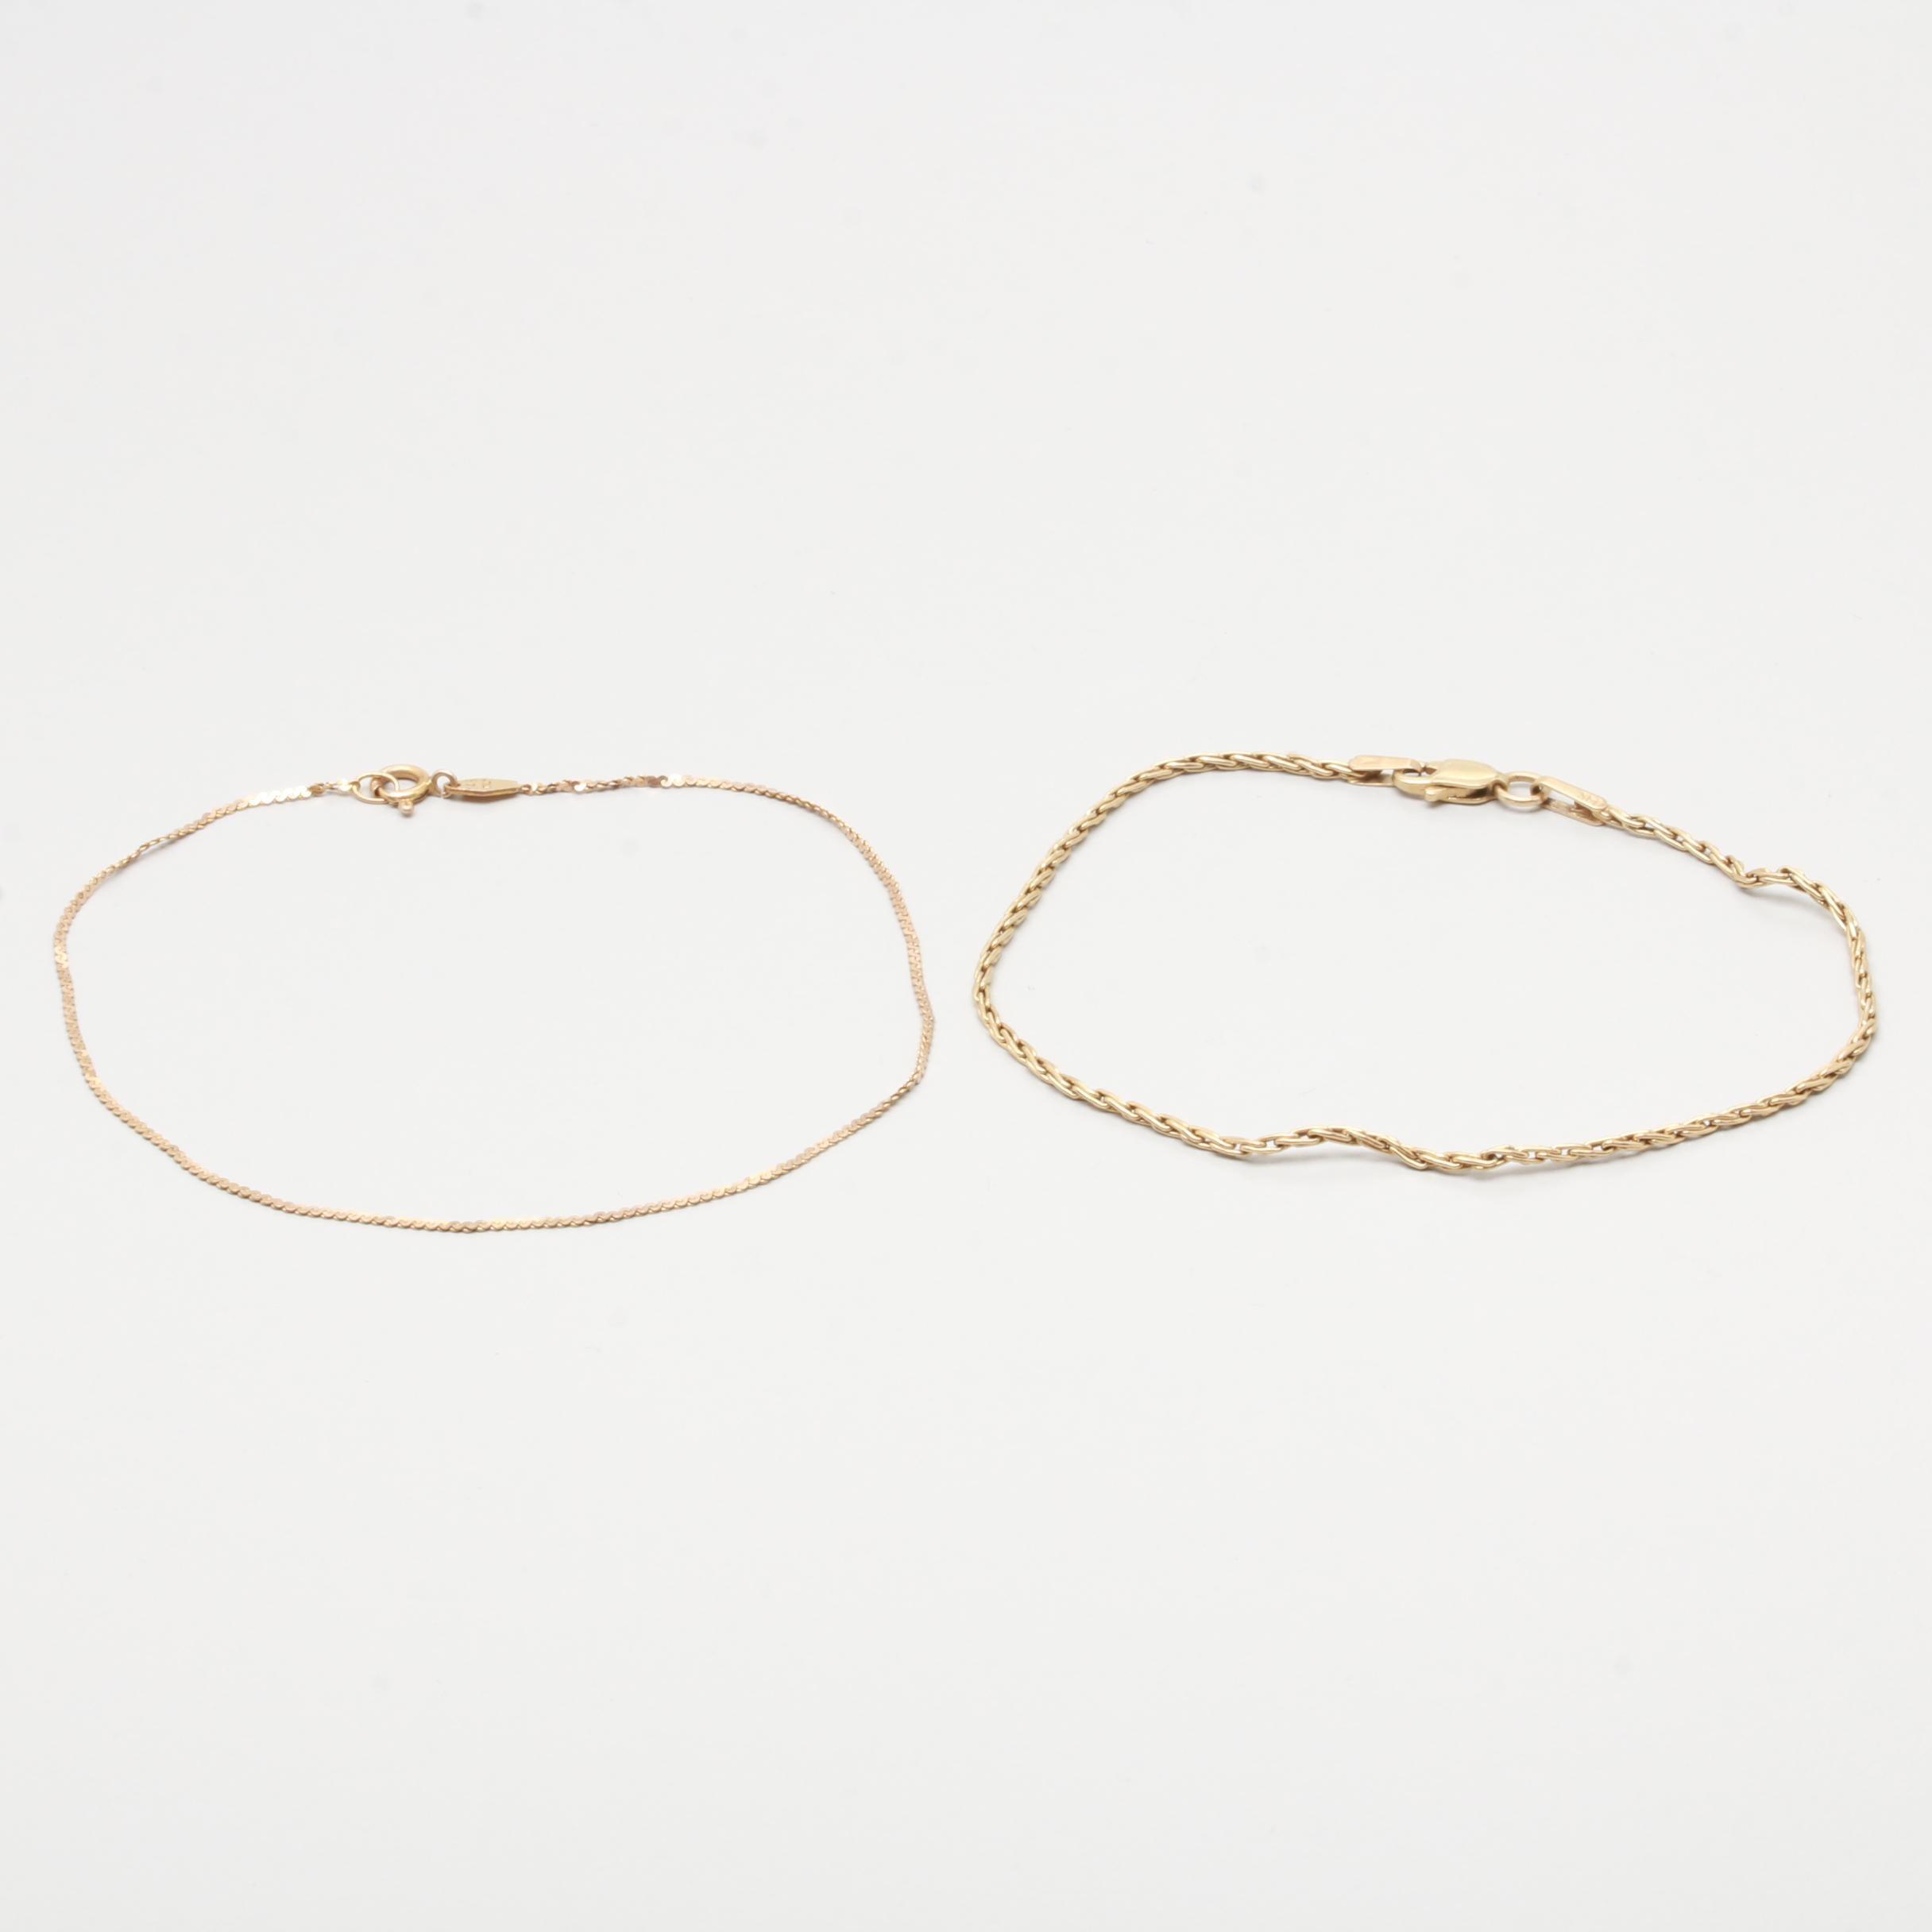 14K Yellow Gold Bracelets